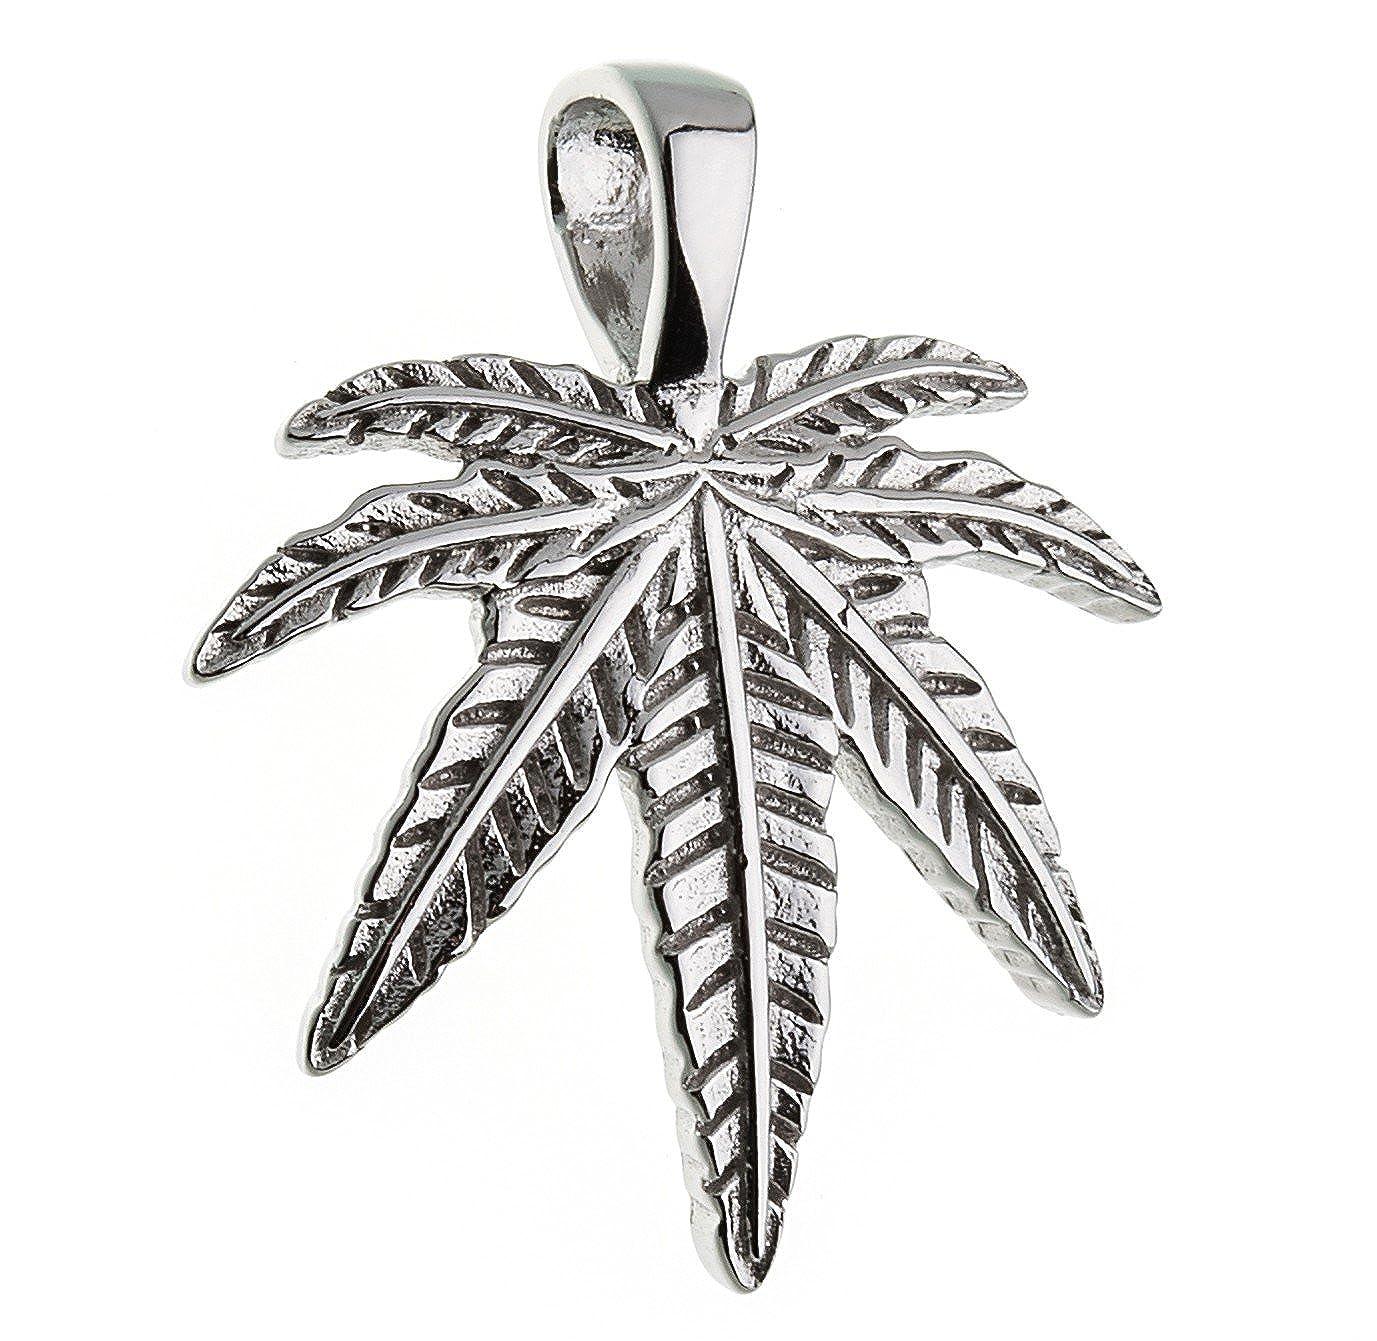 Anhänger Hanfblatt, Cannabisblatt - echt 925 Silber Anhänger Hanfblatt Silberketten-Store AnhHanf